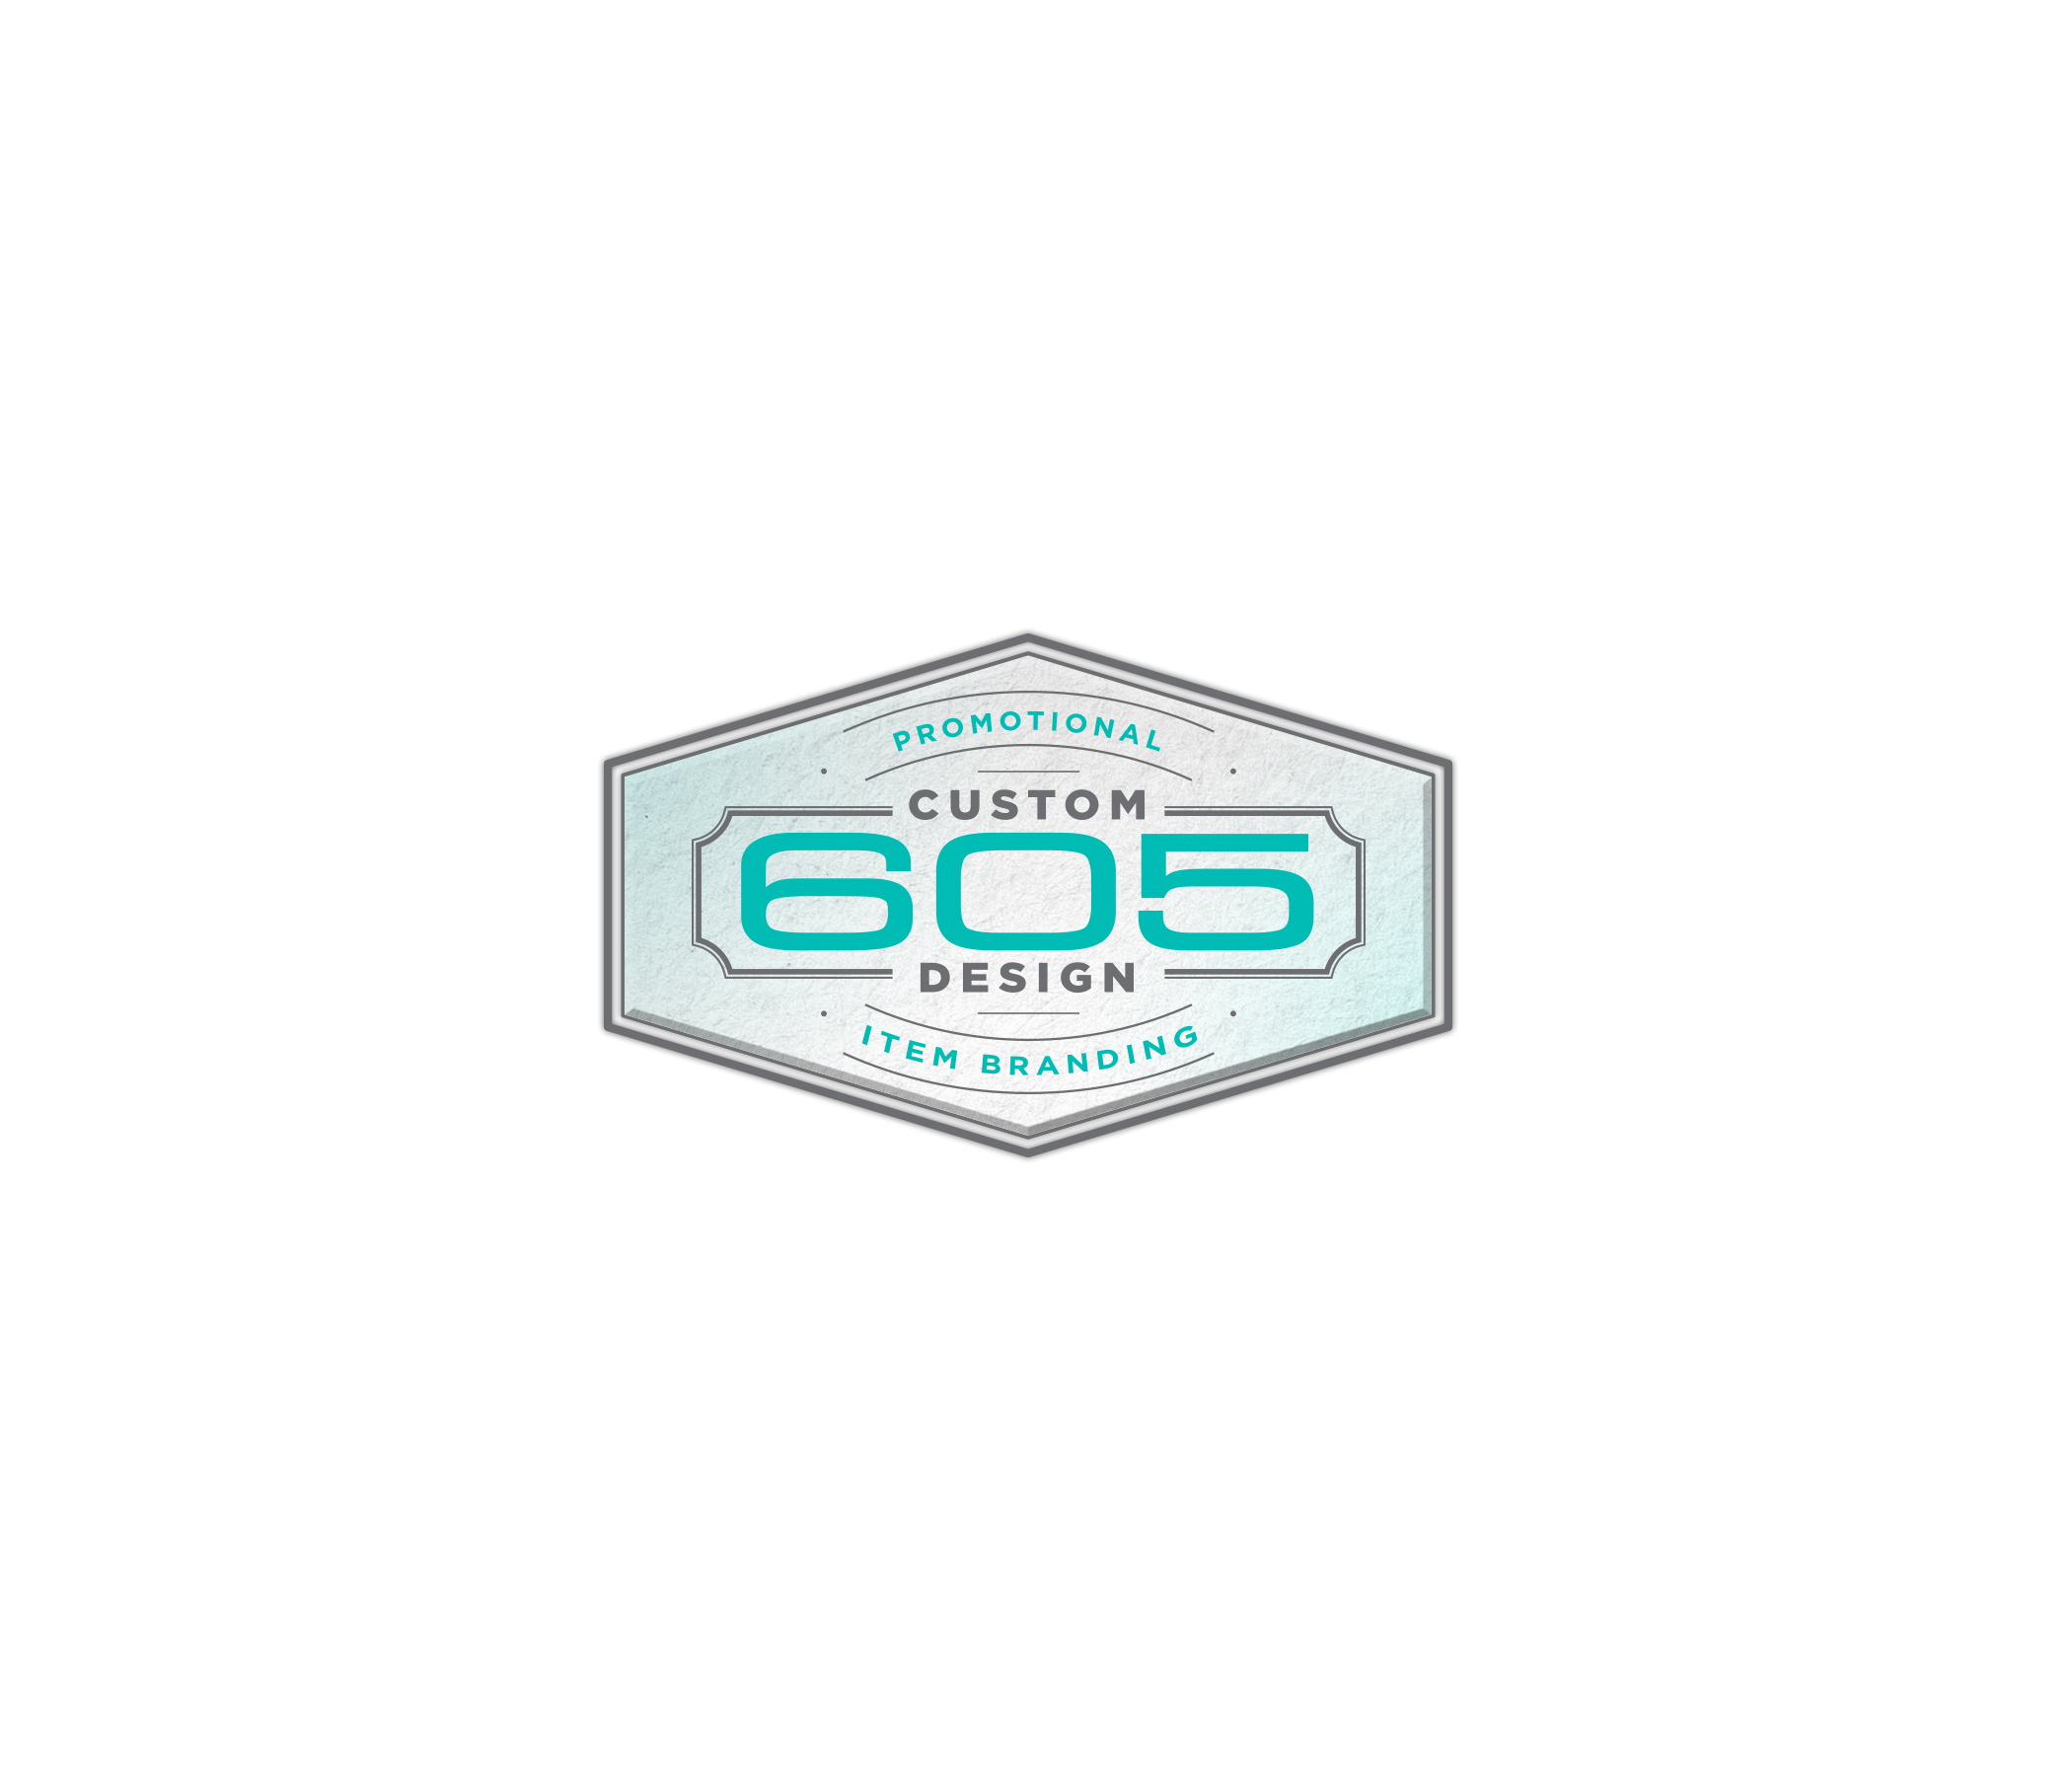 605 Custom Design Promotional Logo